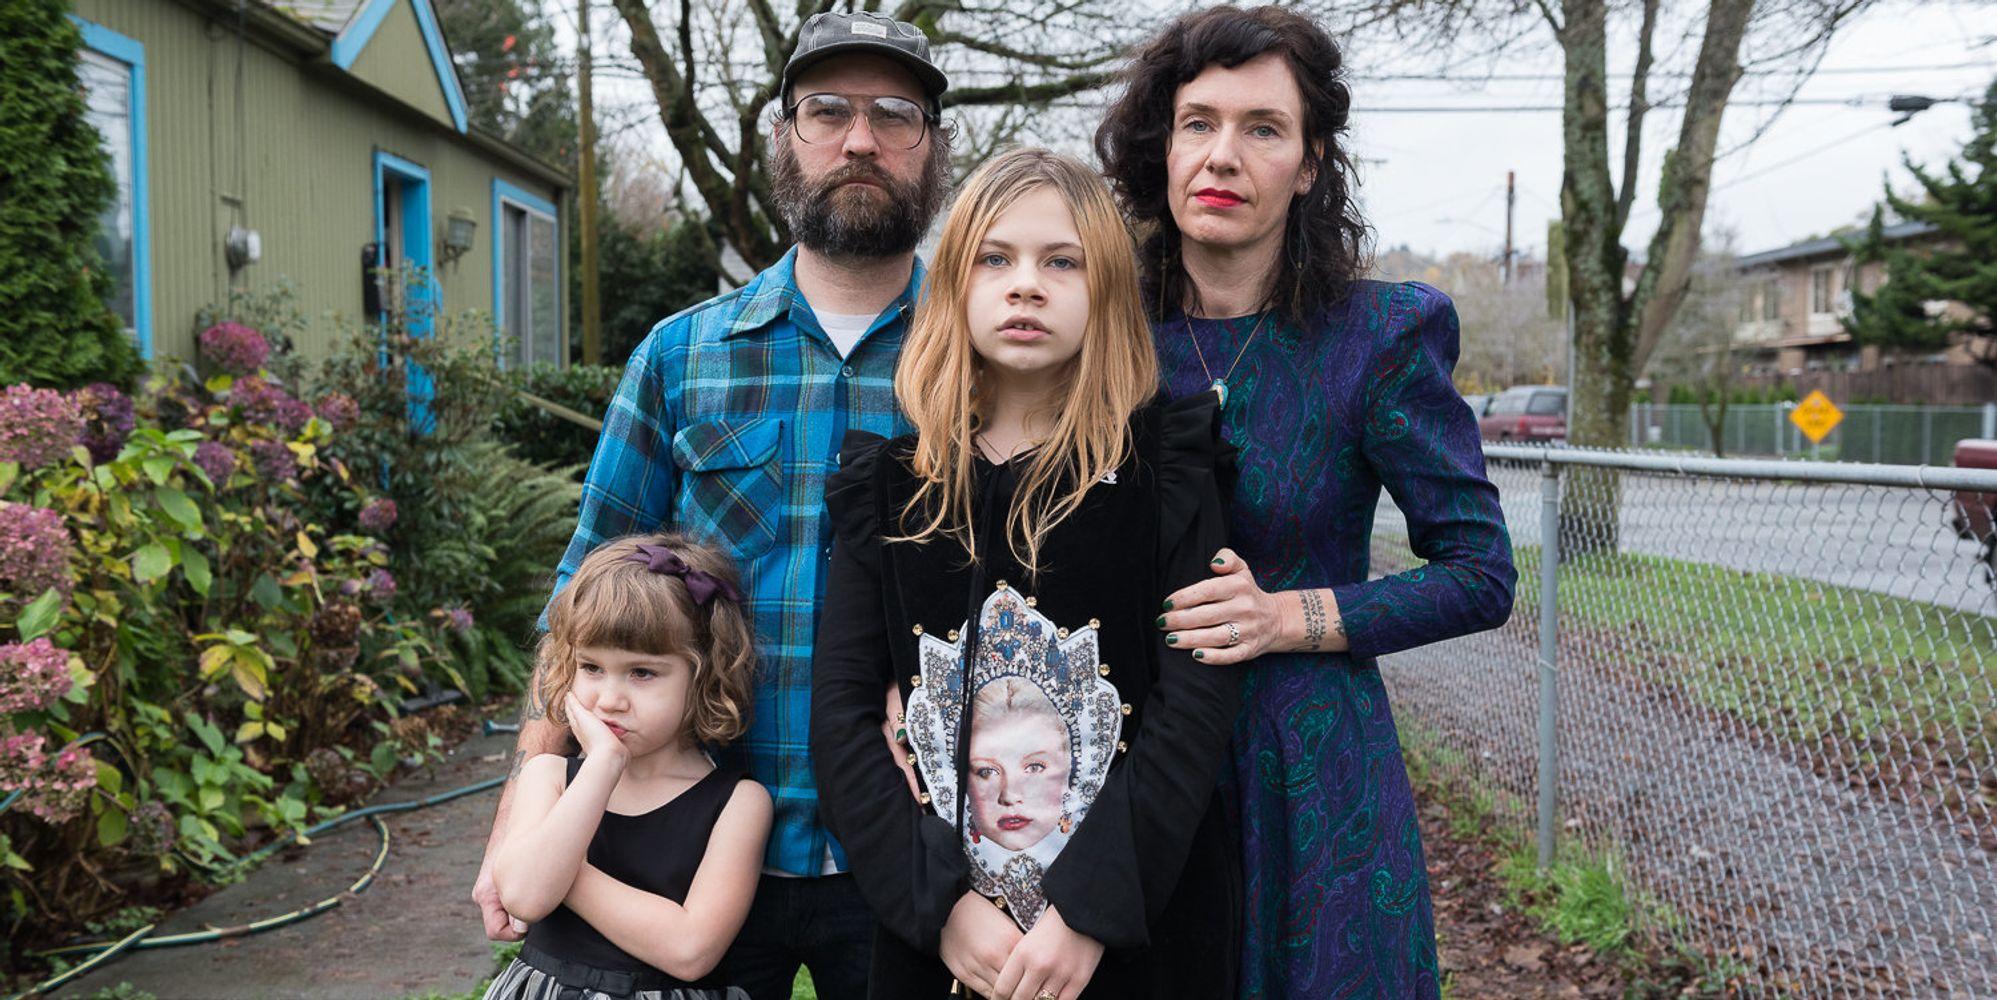 democratic parenting style essay